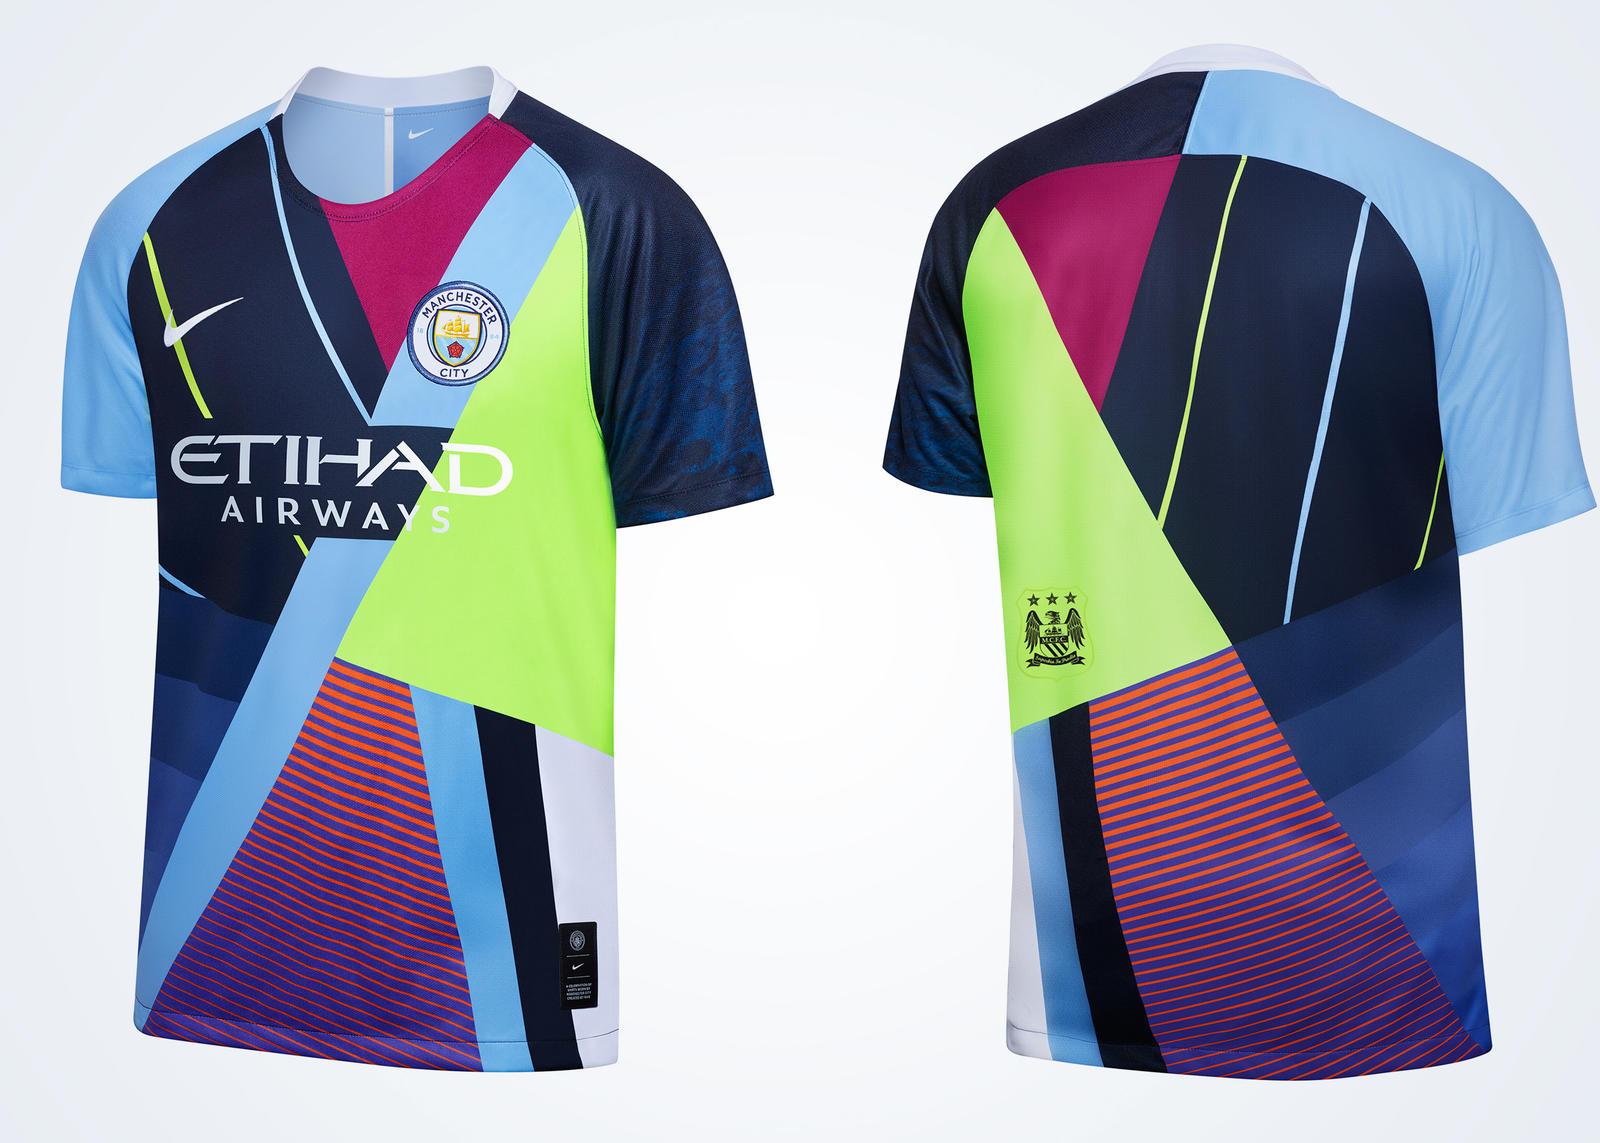 135112182 Nike-Manchester-City-Celebration-2up_rectangle_1600.jpg